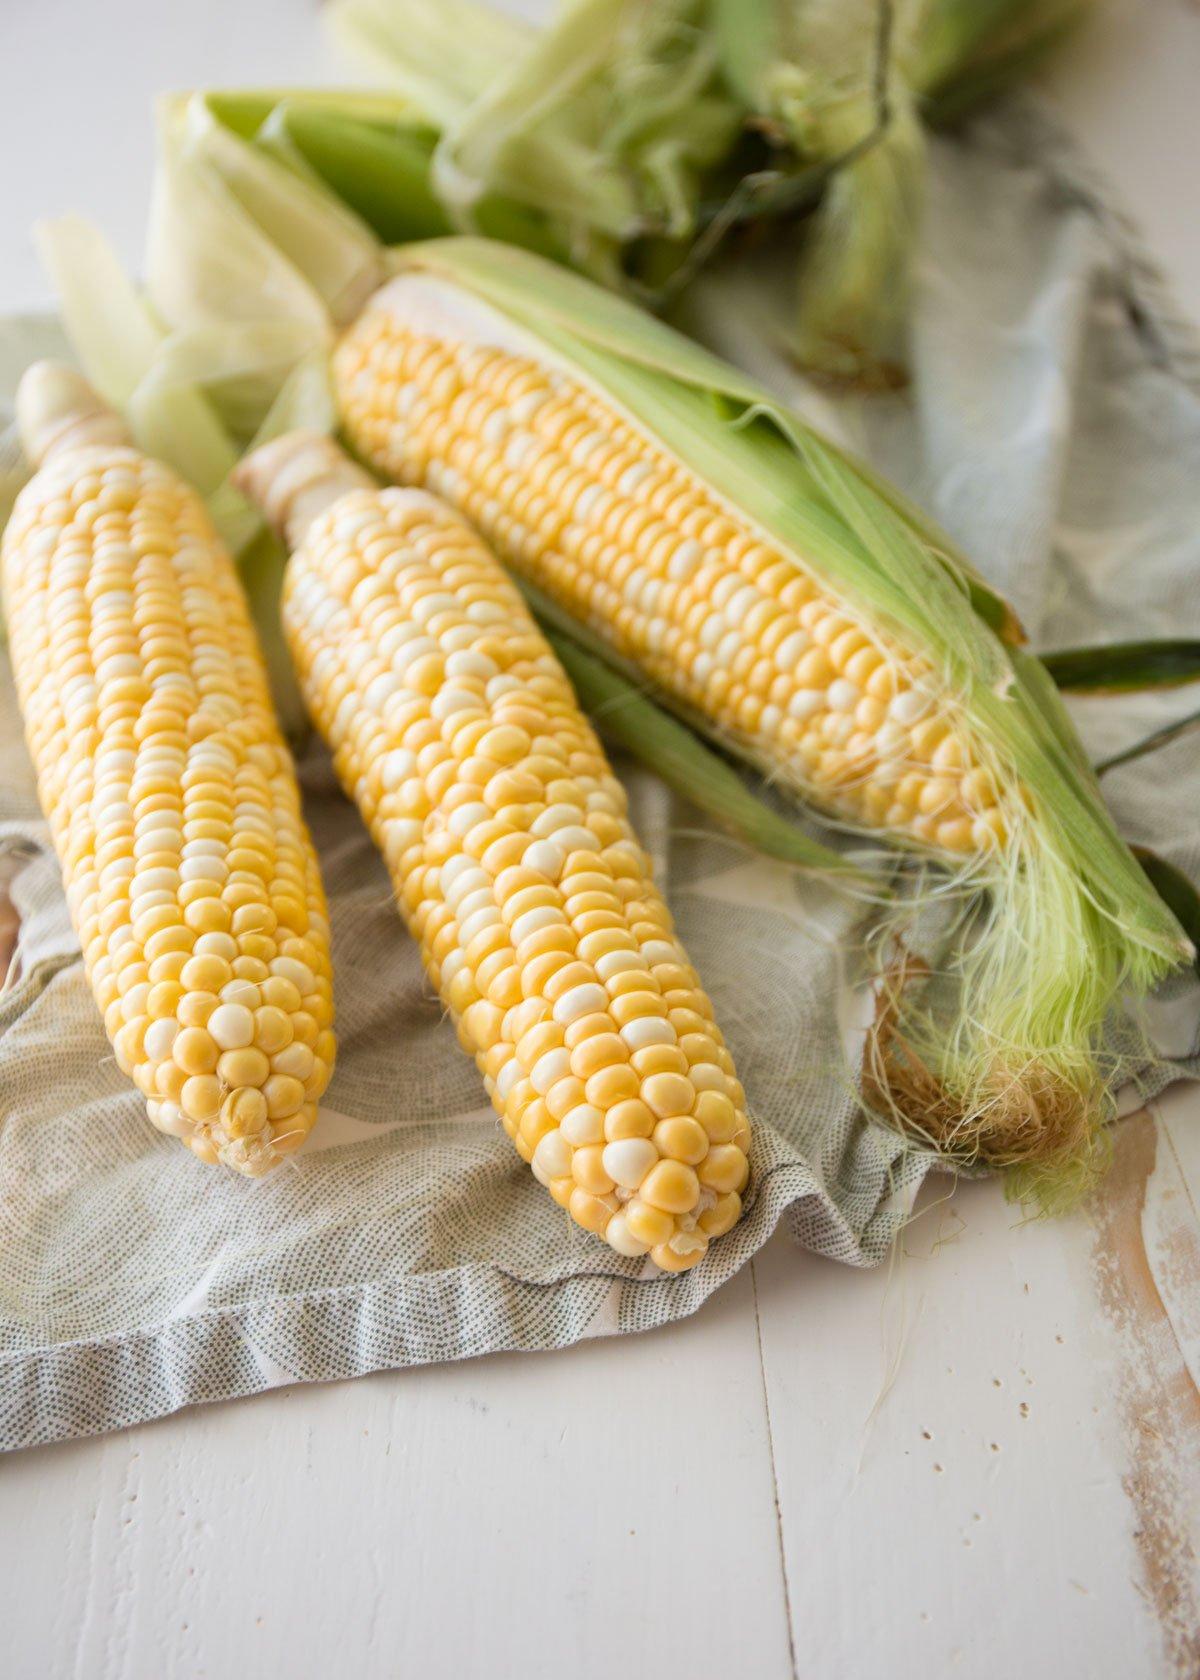 3 cobs of corn on a tan towel